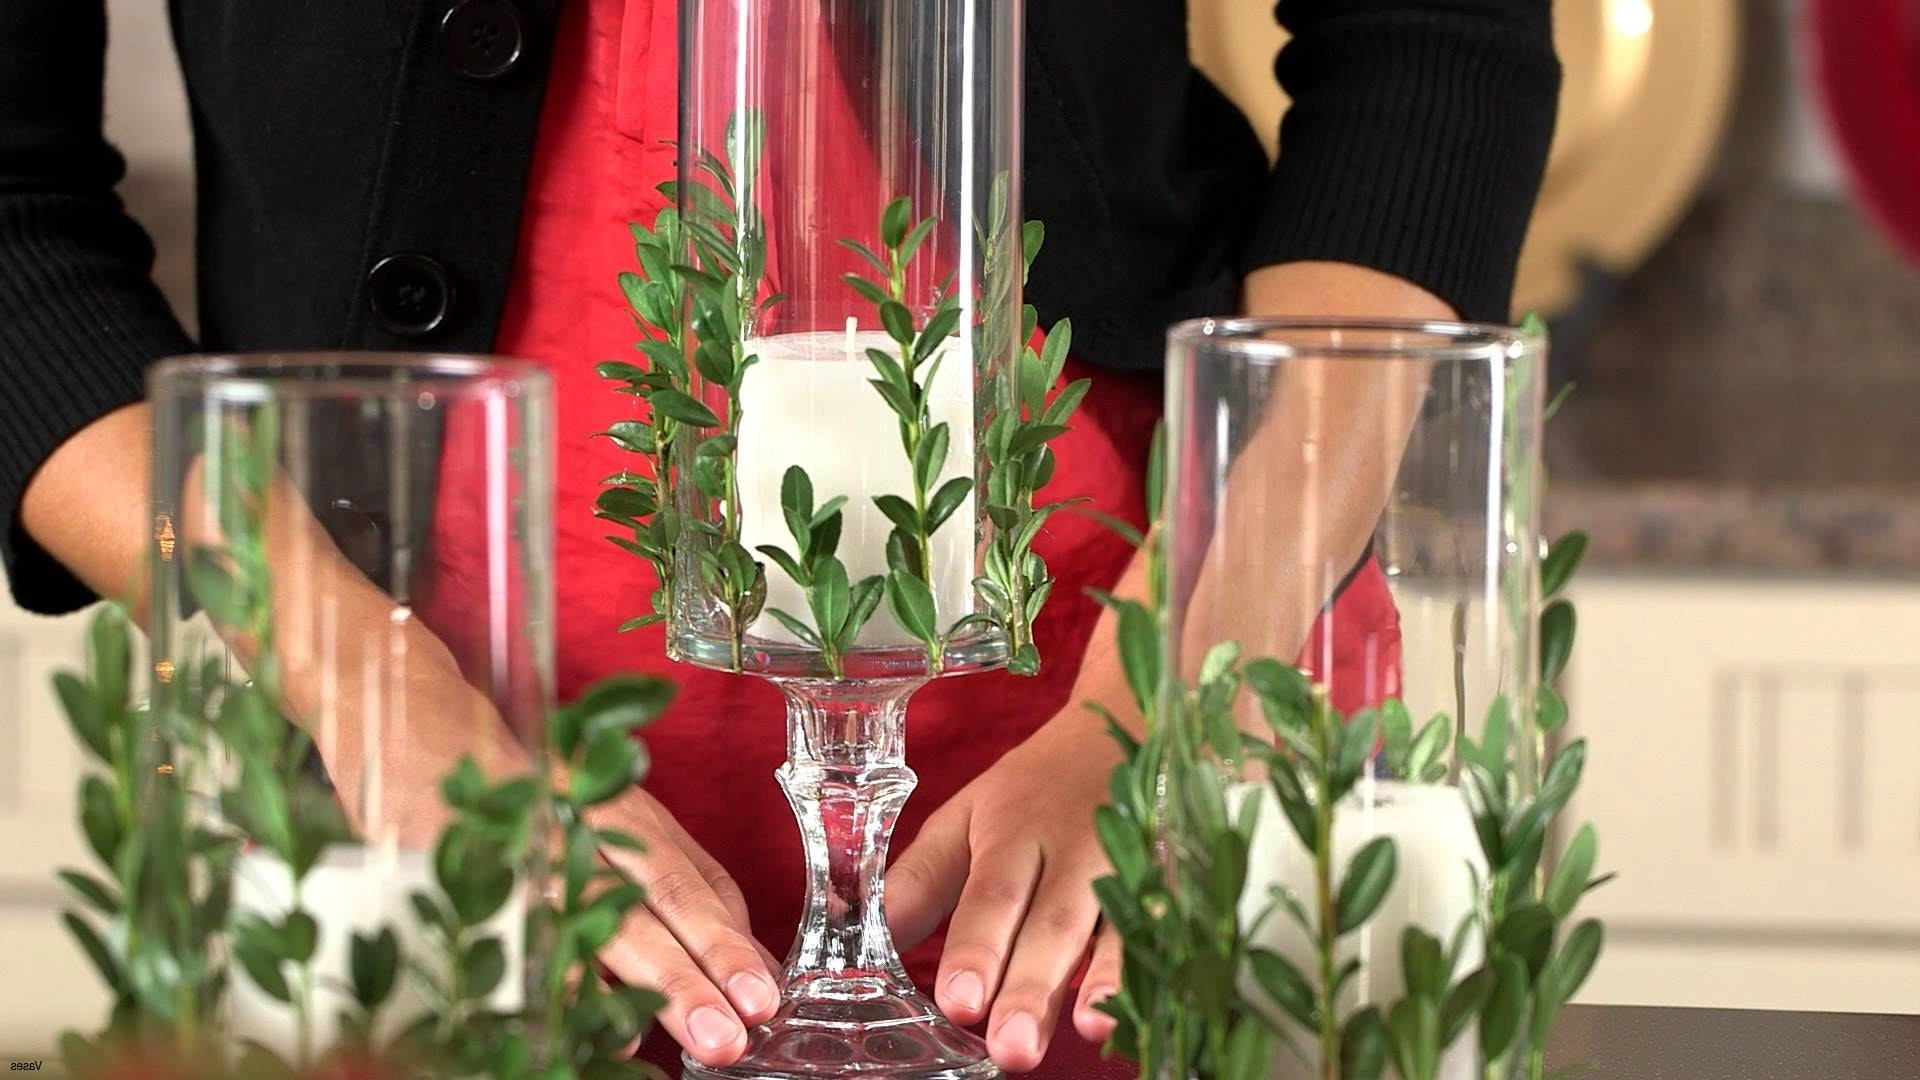 4 x 12 cylinder vase of 19 elegant glass cylinder vases dollar tree bogekompresorturkiye com within dollar tree wedding decorations awesome h vases dollar vase i 0d inspiration wedding centerpiece vases